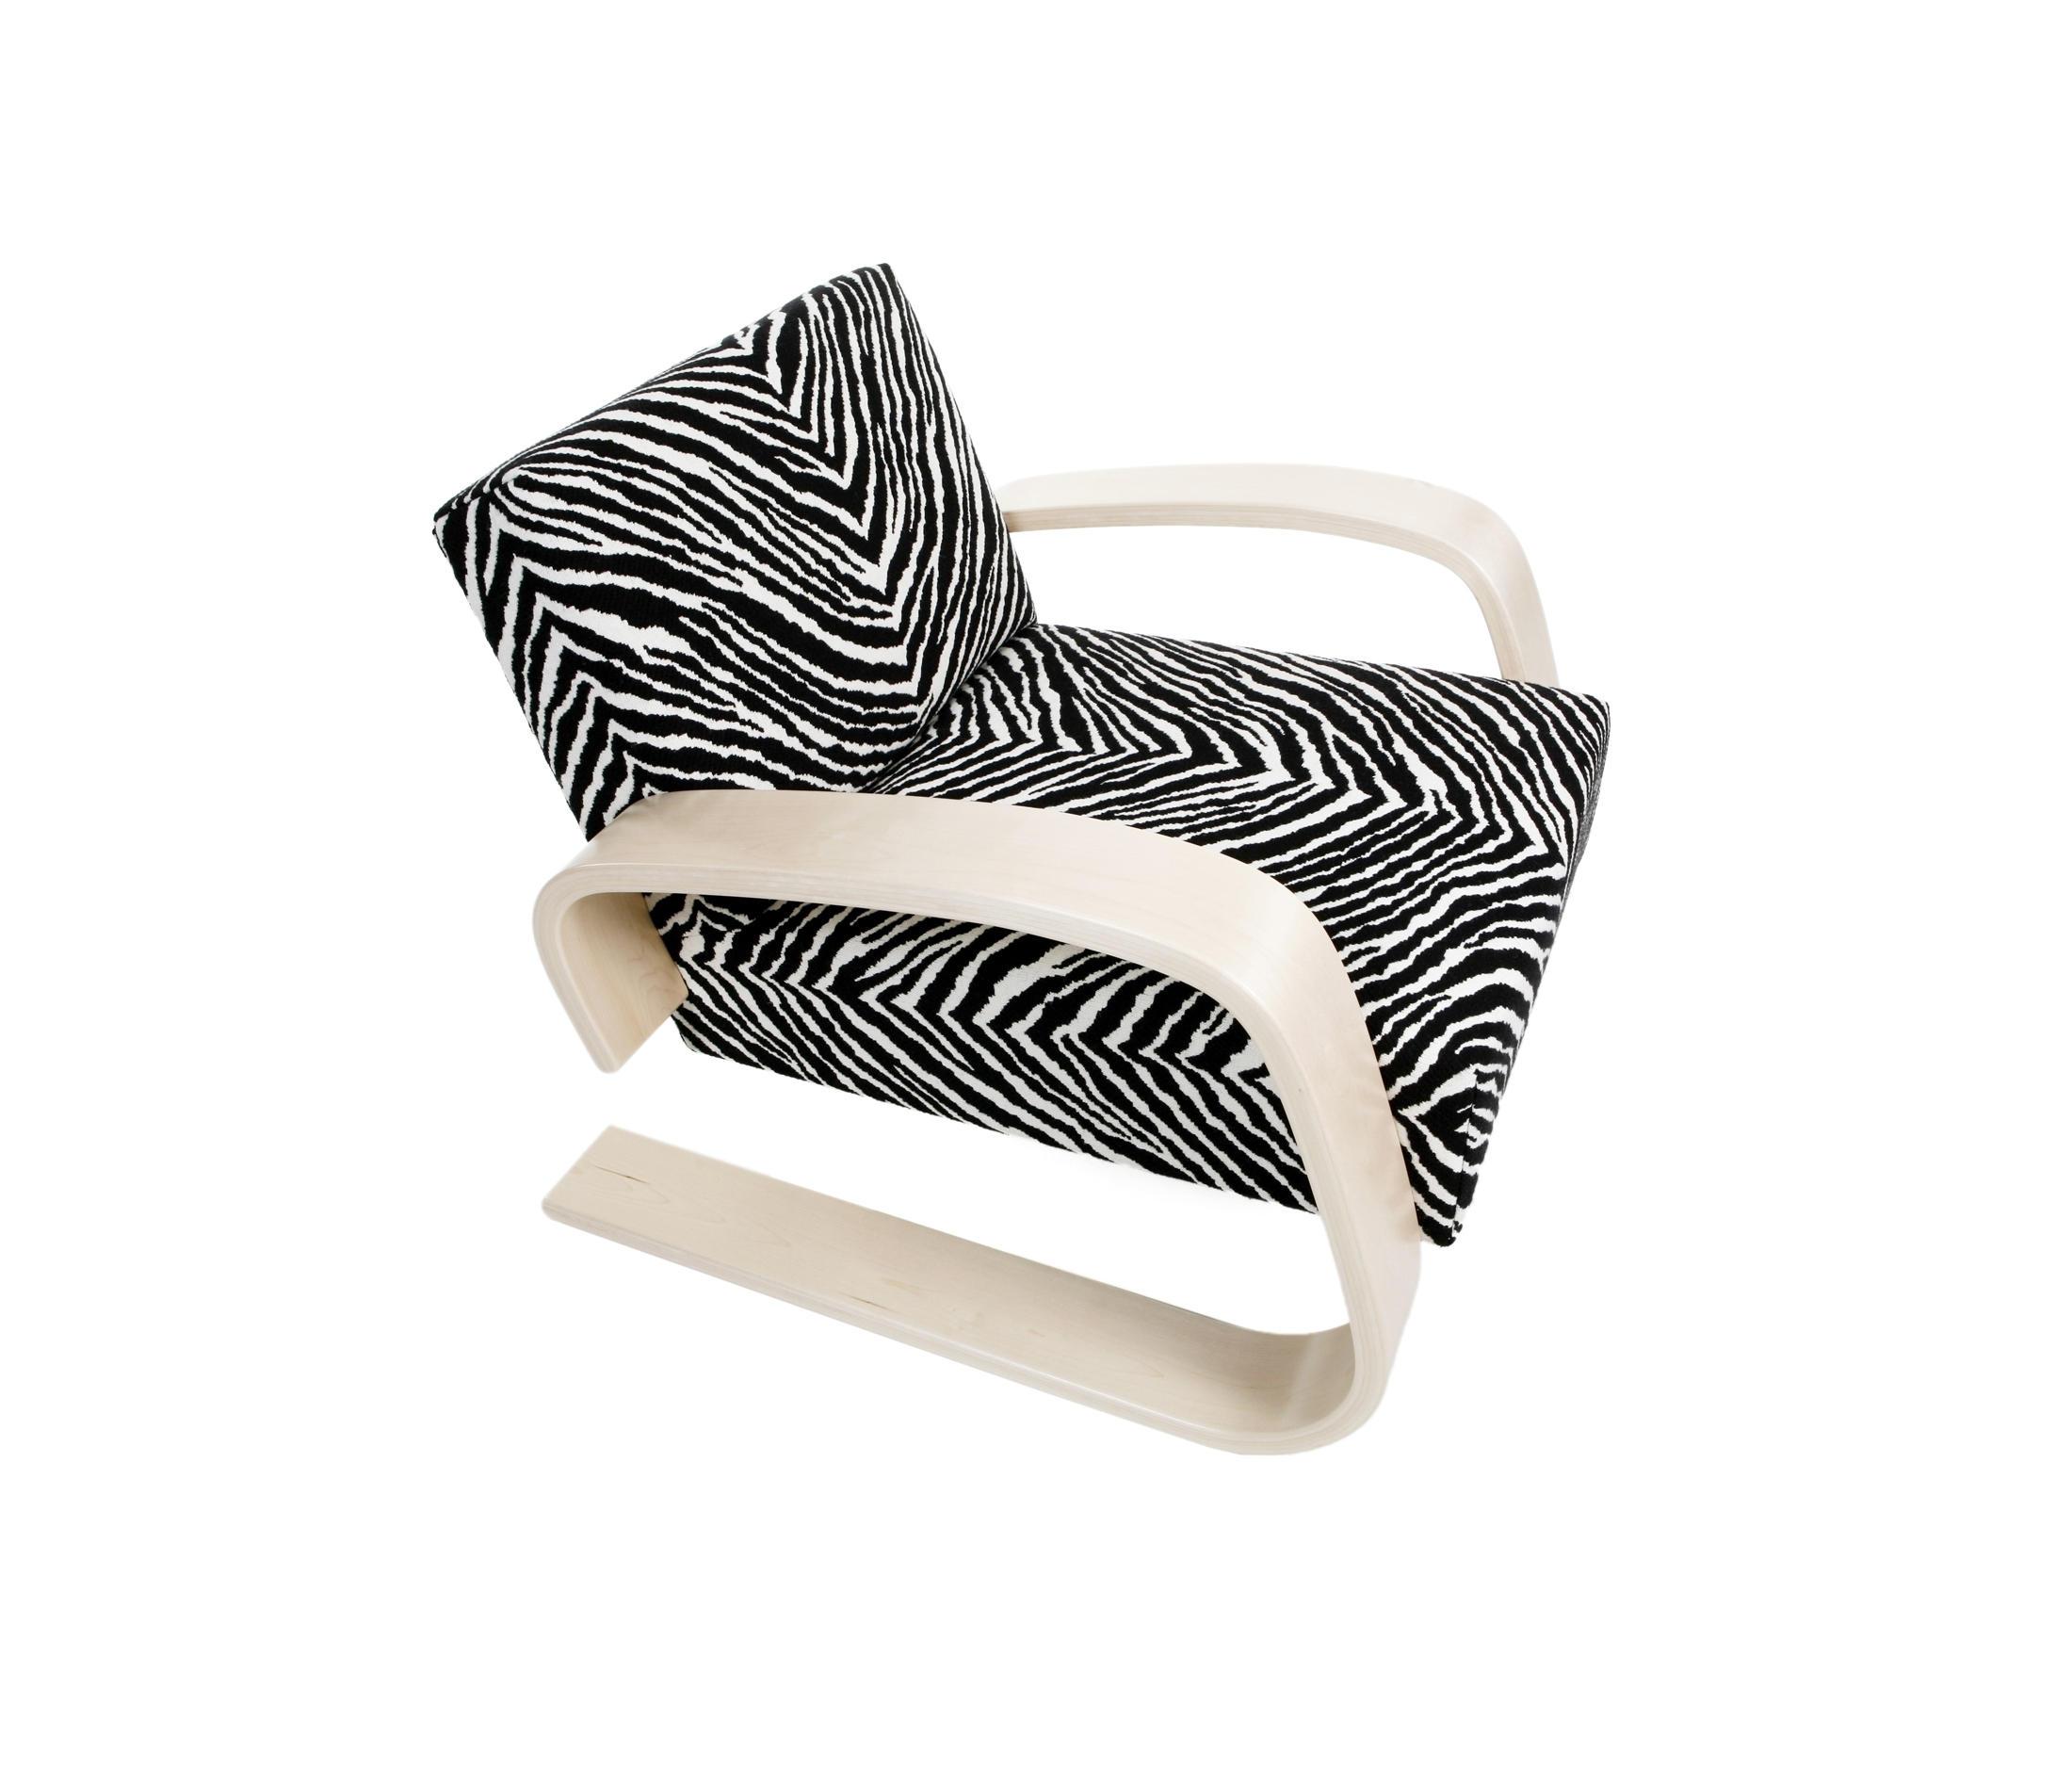 ARMCHAIR 400 TANK Lounge chairs from Artek